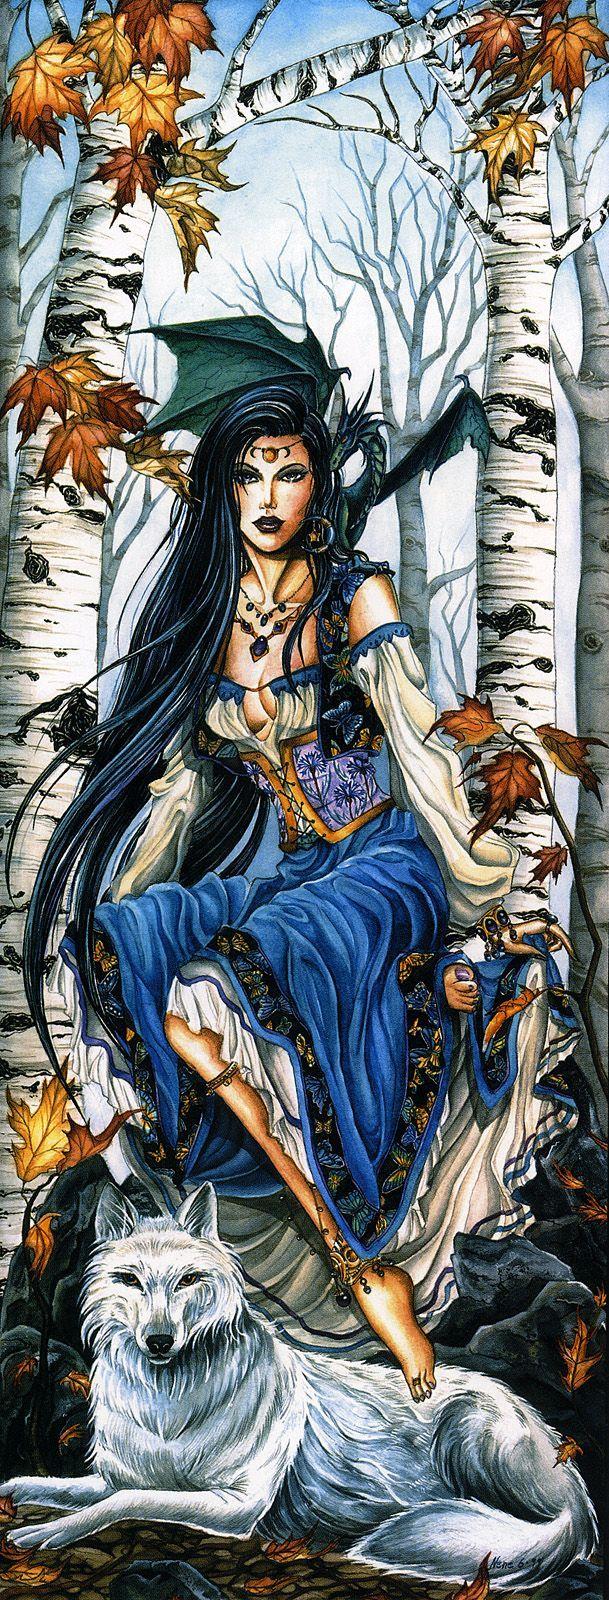 Nene Thomas Art | Nene Thomas - Sisters 1: Misty Morning | Fantasy Art I Love